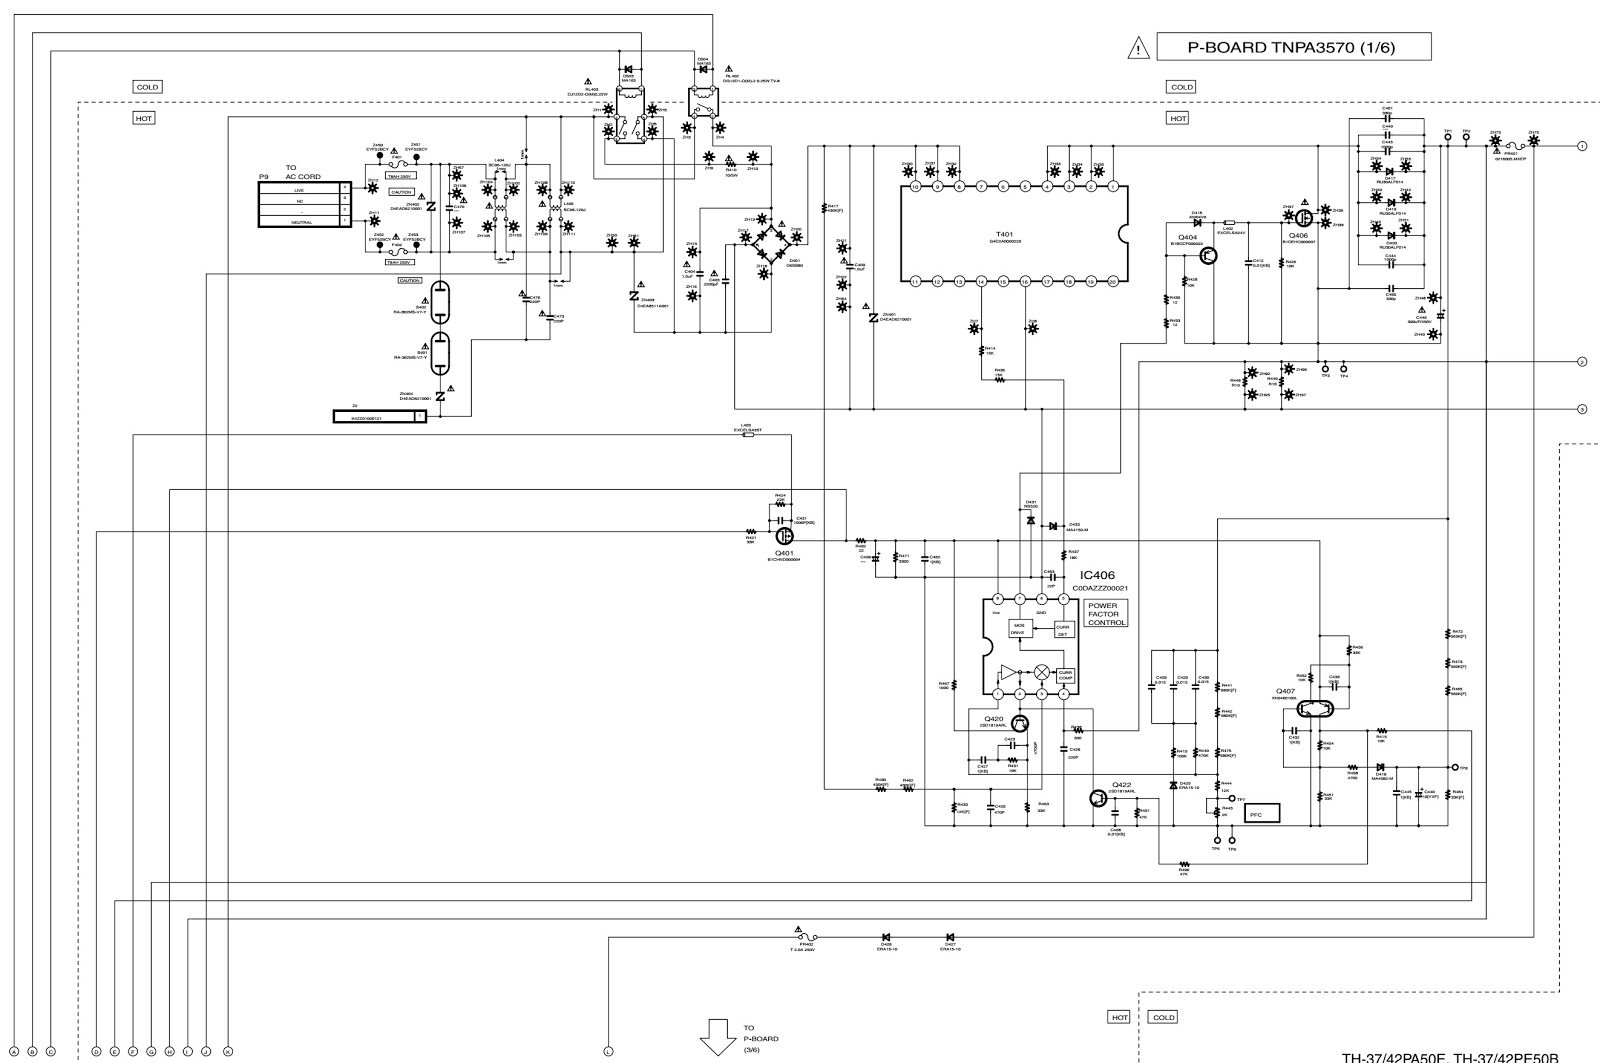 medium resolution of panasonic plasma tv th42 th37 power board schematic schematic panasonic plasma tv circuit diagram panasonic plasma tv diagram